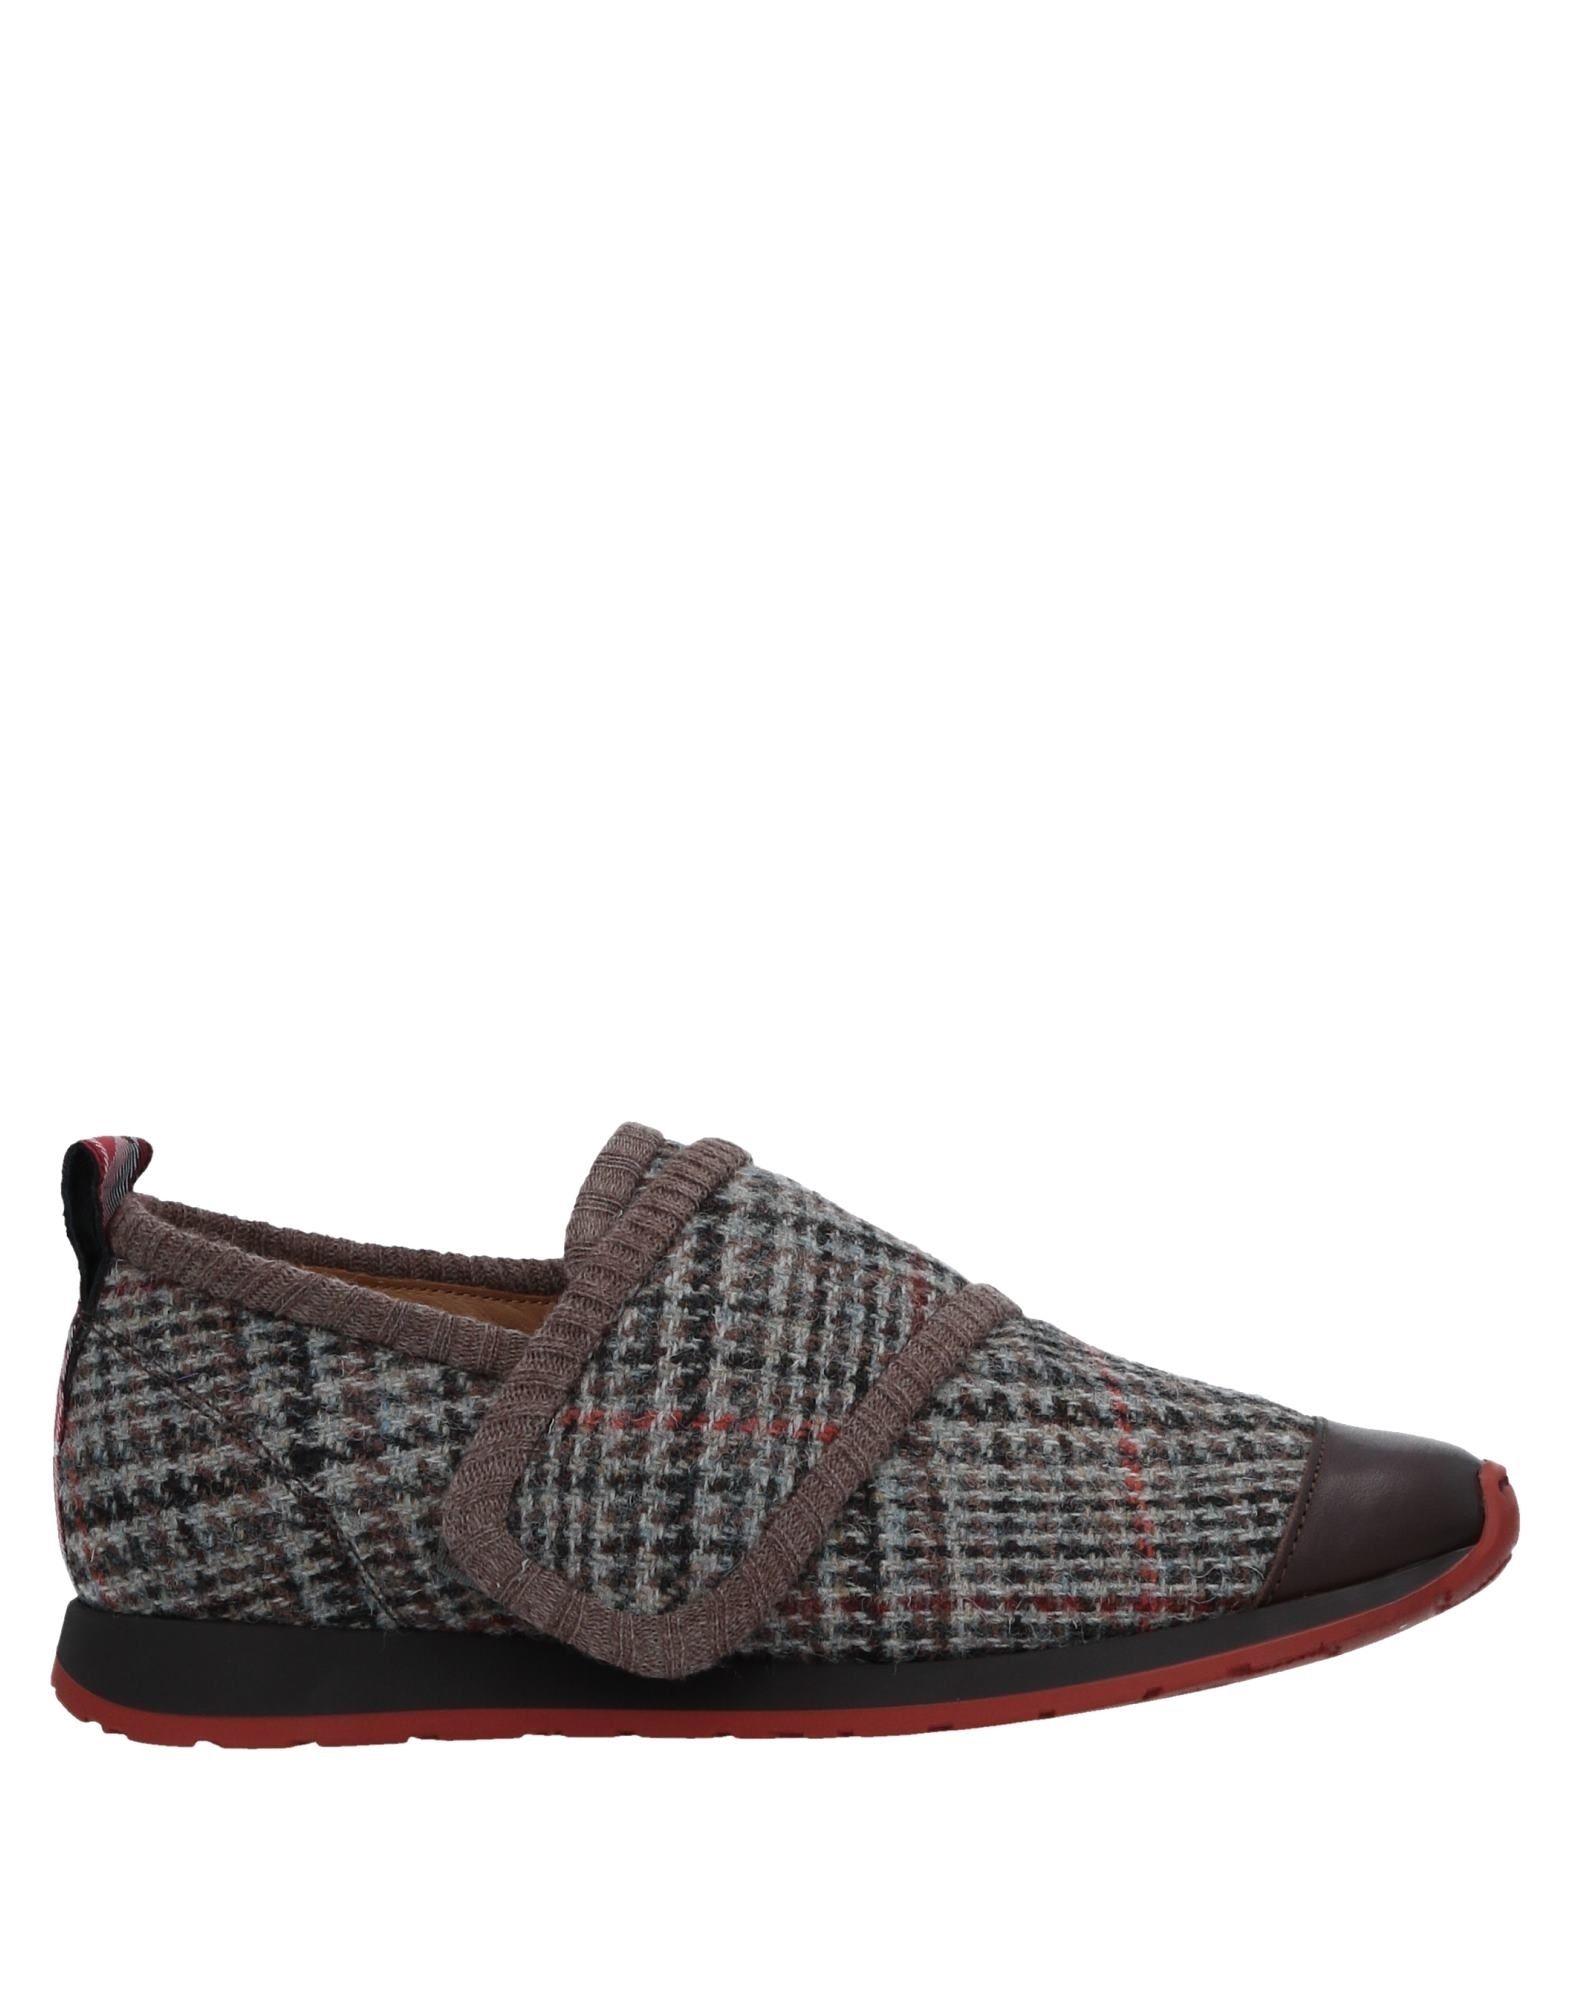 Vivienne Westwood Loafers Loafers - Women Vivienne Westwood Loafers Loafers online on  United Kingdom - 11517373KH ec7996